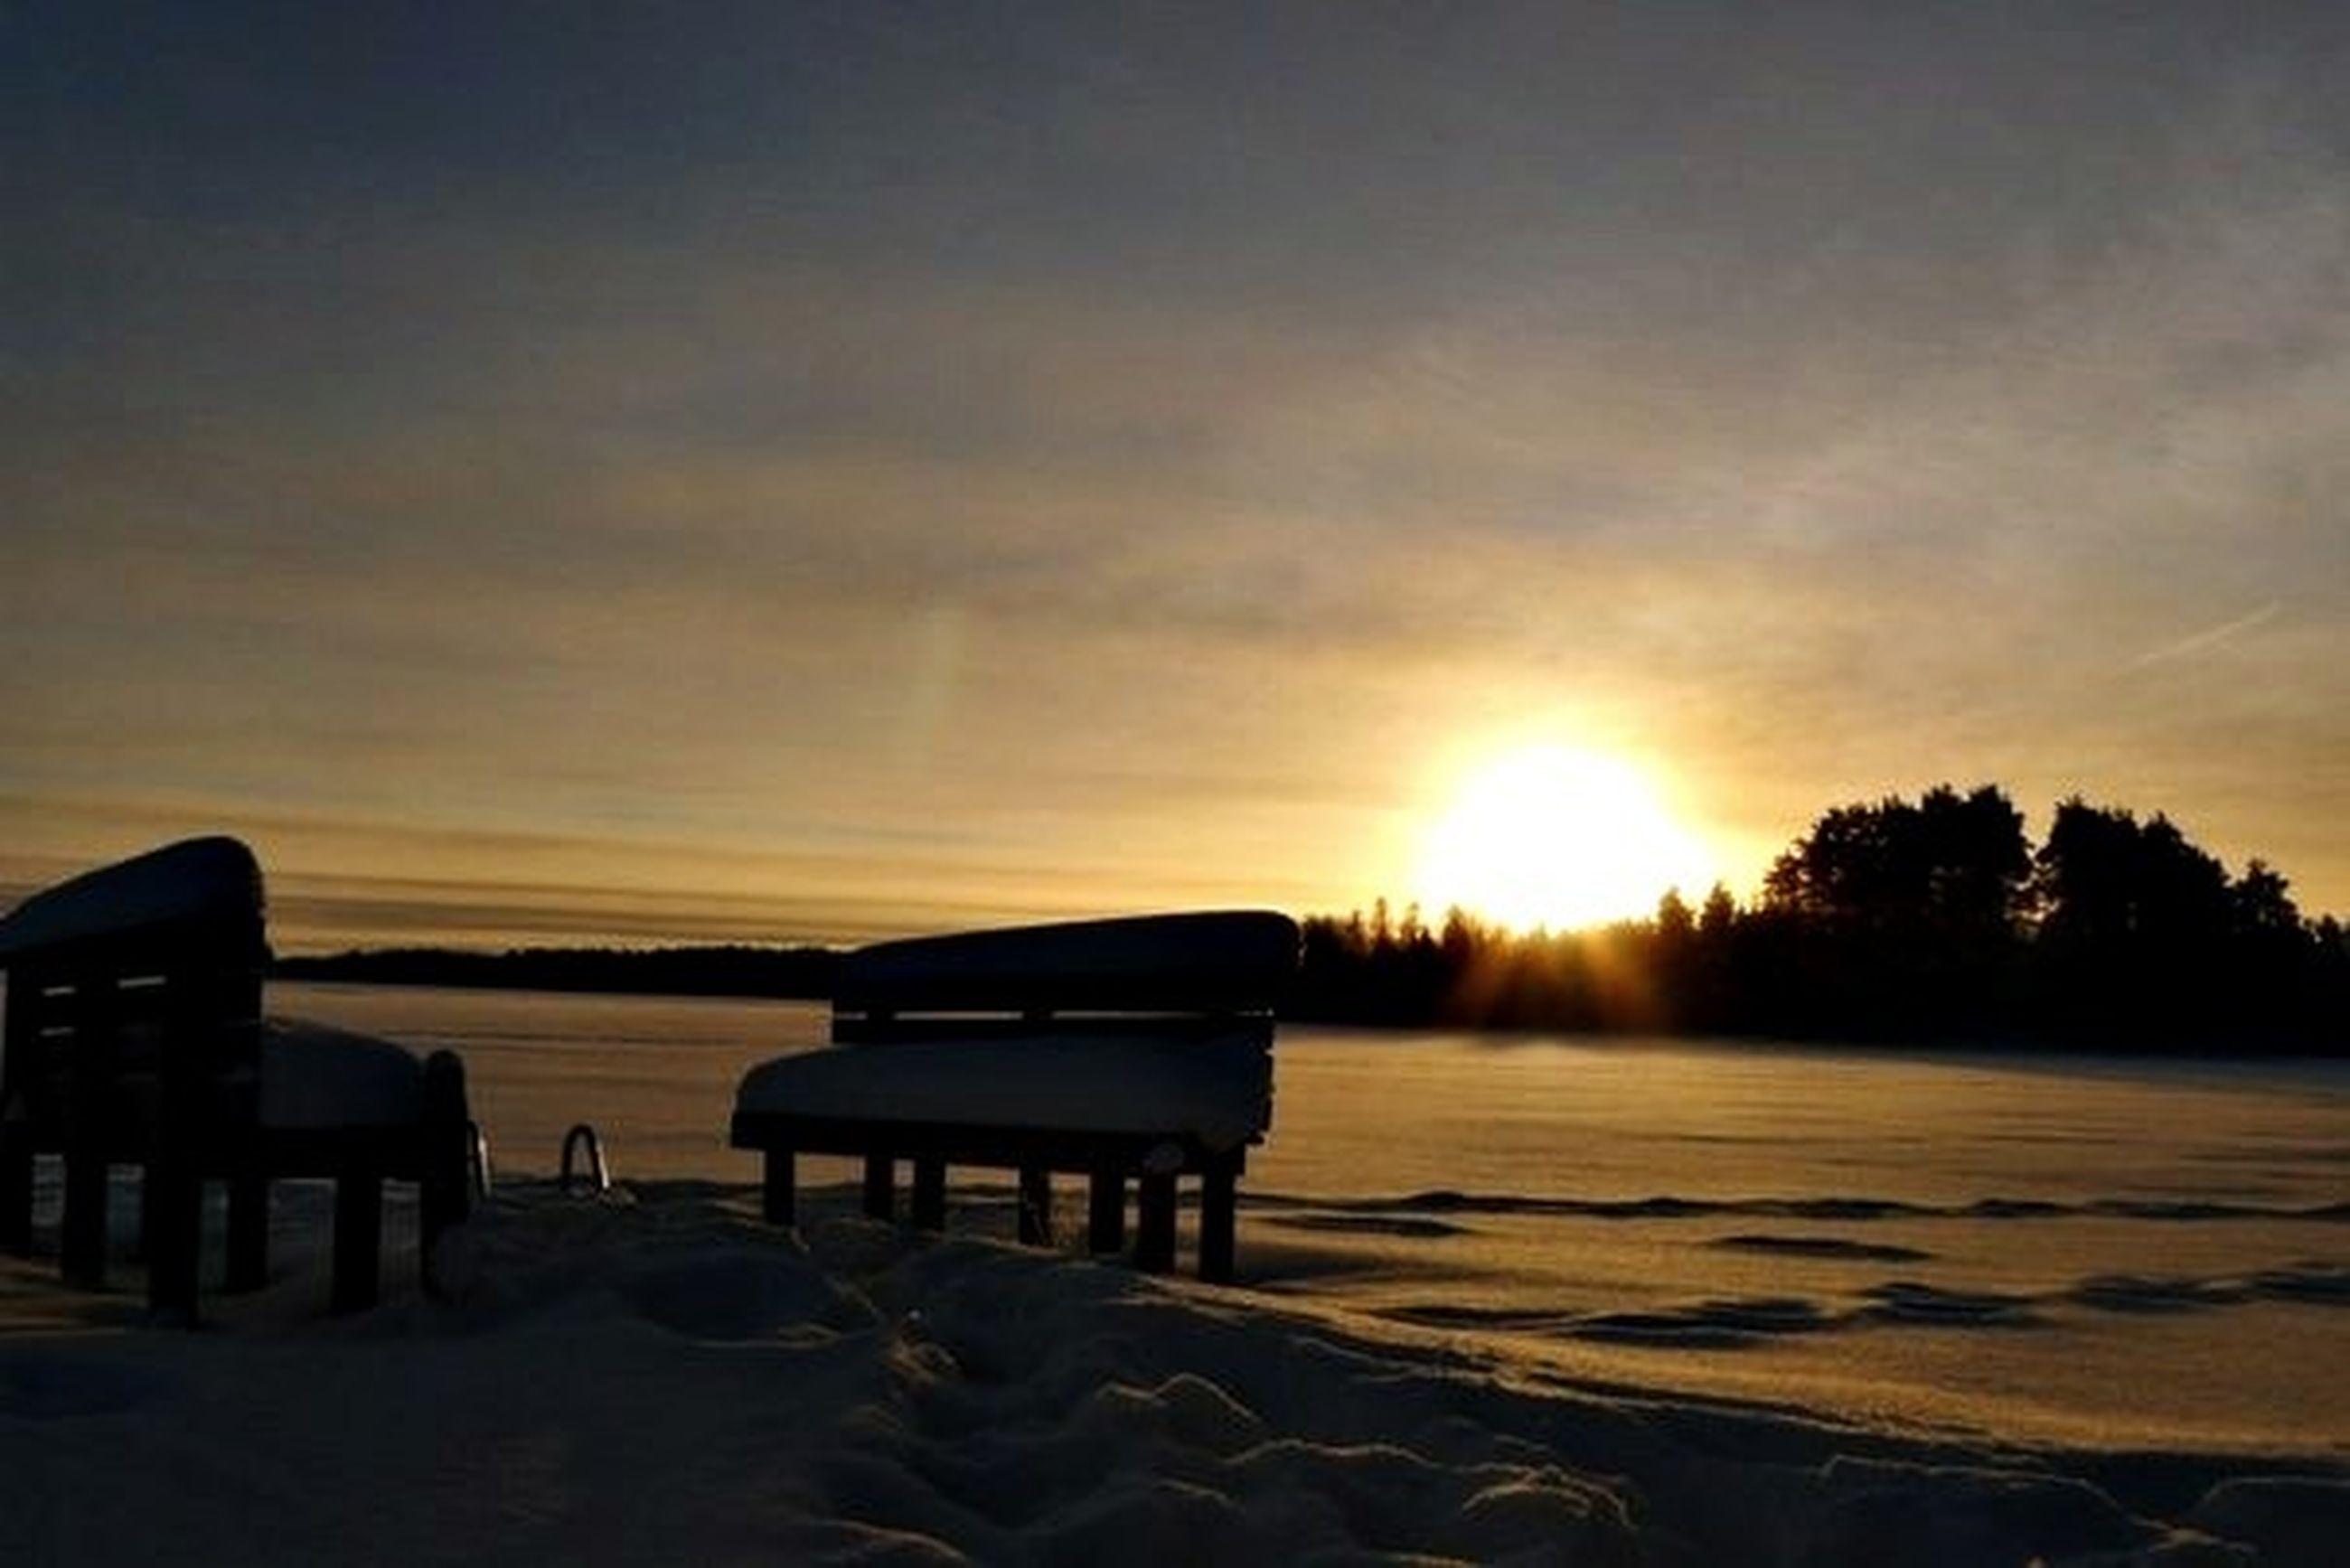 sunset, sun, sky, tranquility, tranquil scene, scenics, beauty in nature, silhouette, beach, sunlight, nature, orange color, sea, cloud - sky, water, idyllic, sunbeam, chair, shore, snow